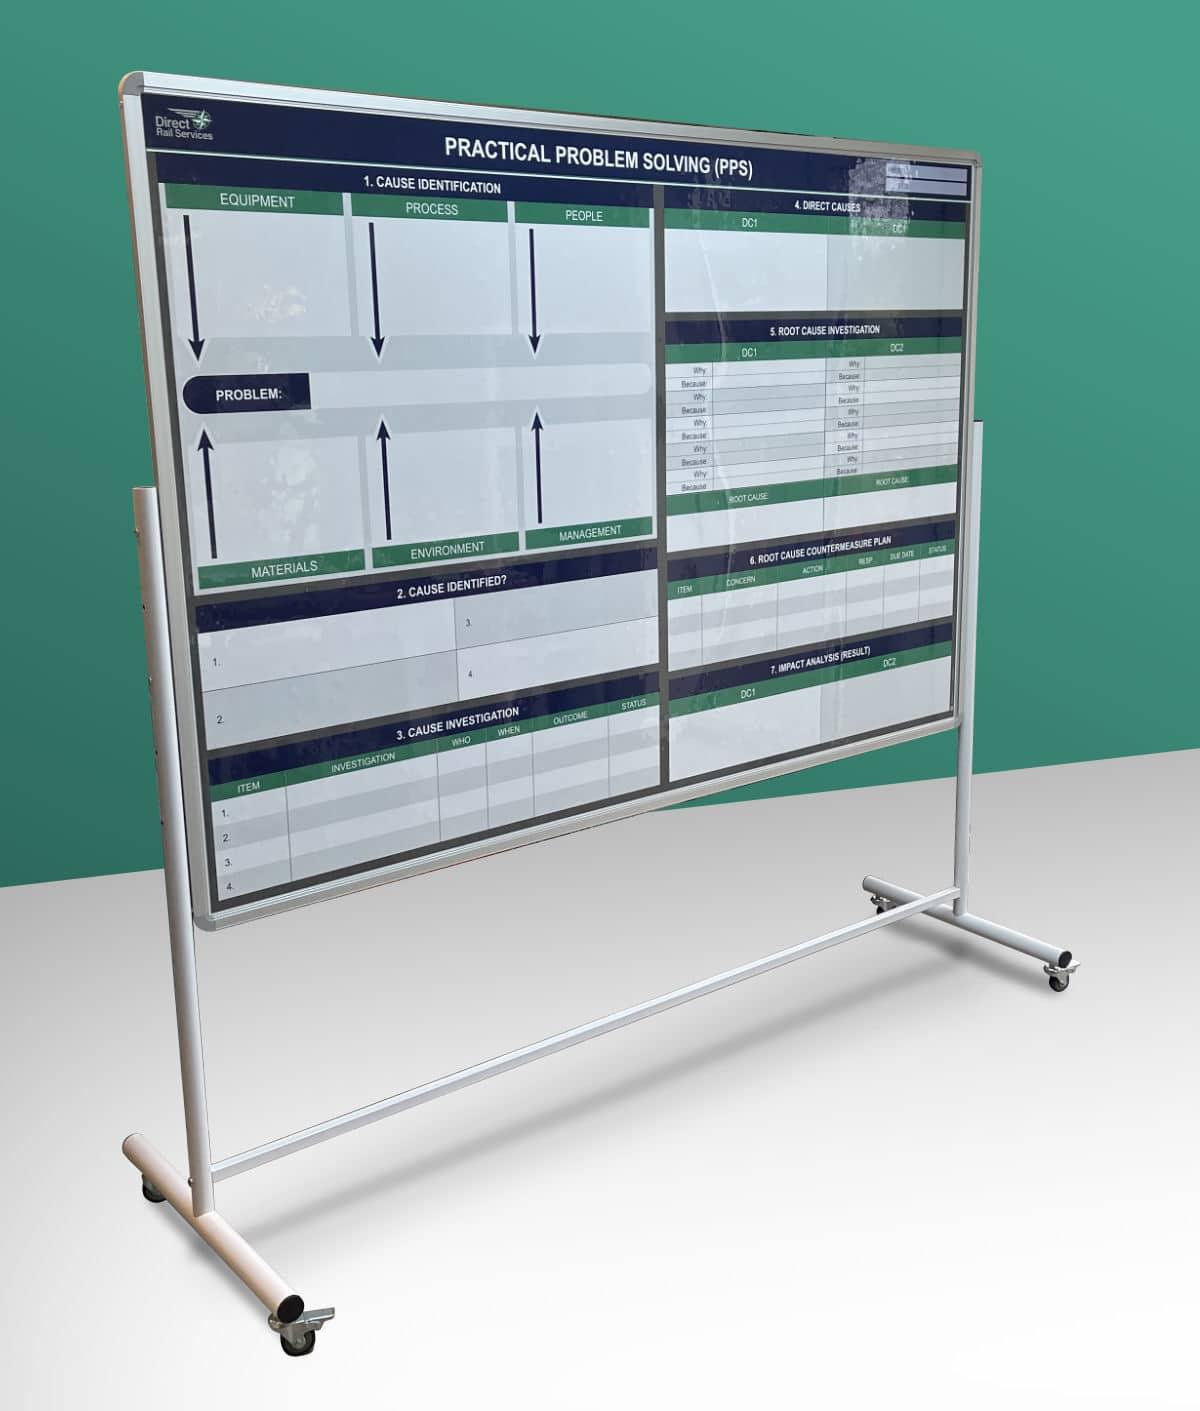 Mobile Practical Problem Solving board